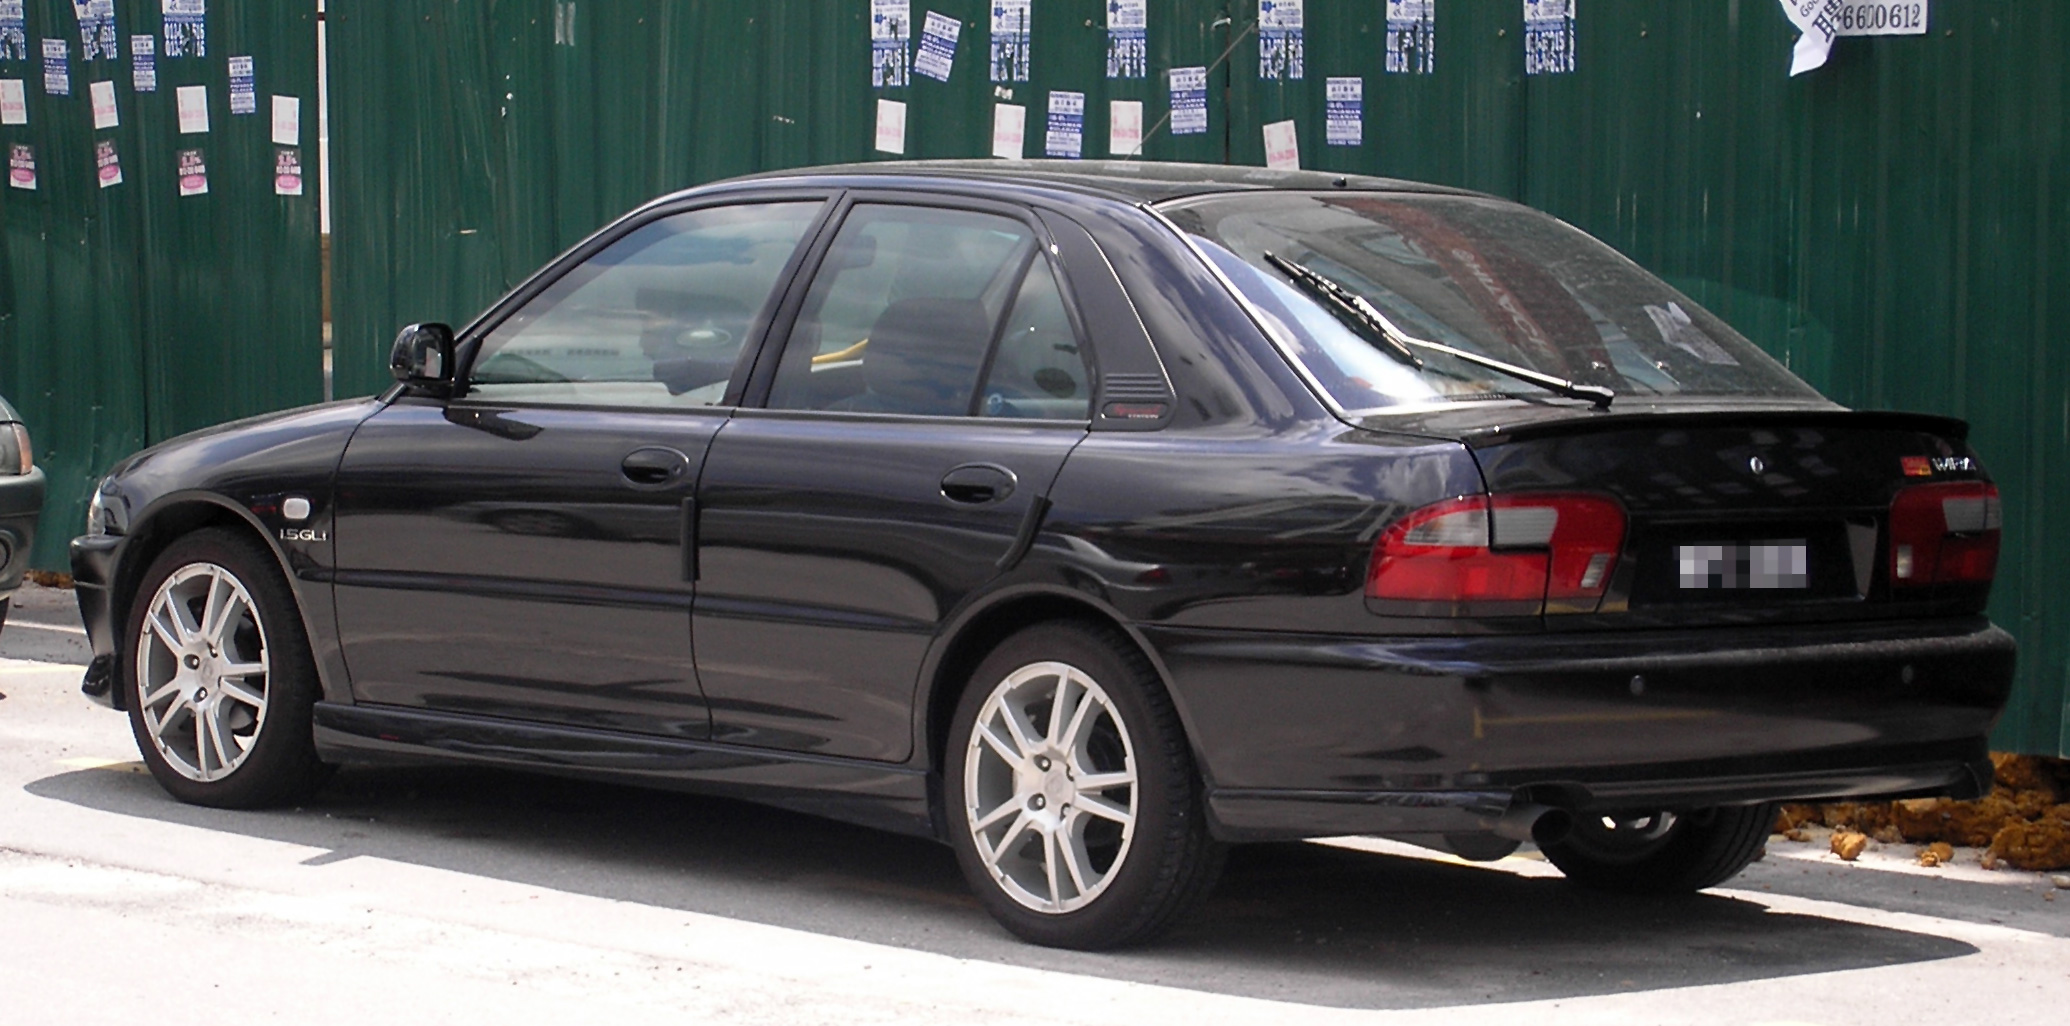 Nuova Kia soul Proton_Wira_(Aeroback,_Special_Edition)_(first_generation,_second_facelift)_(rear),_Serdang